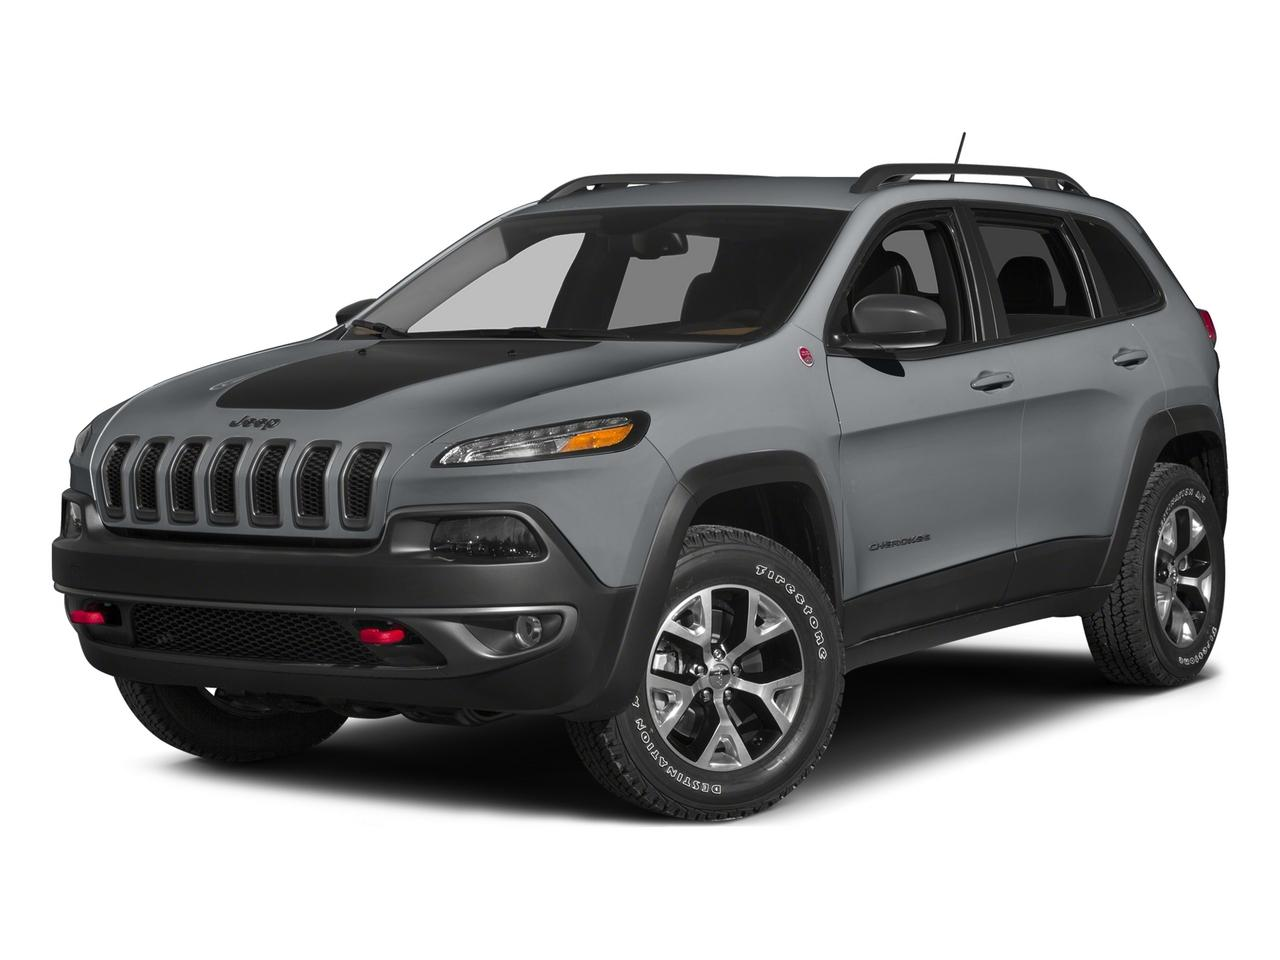 2015 Jeep Cherokee Vehicle Photo in Greeley, CO 80634